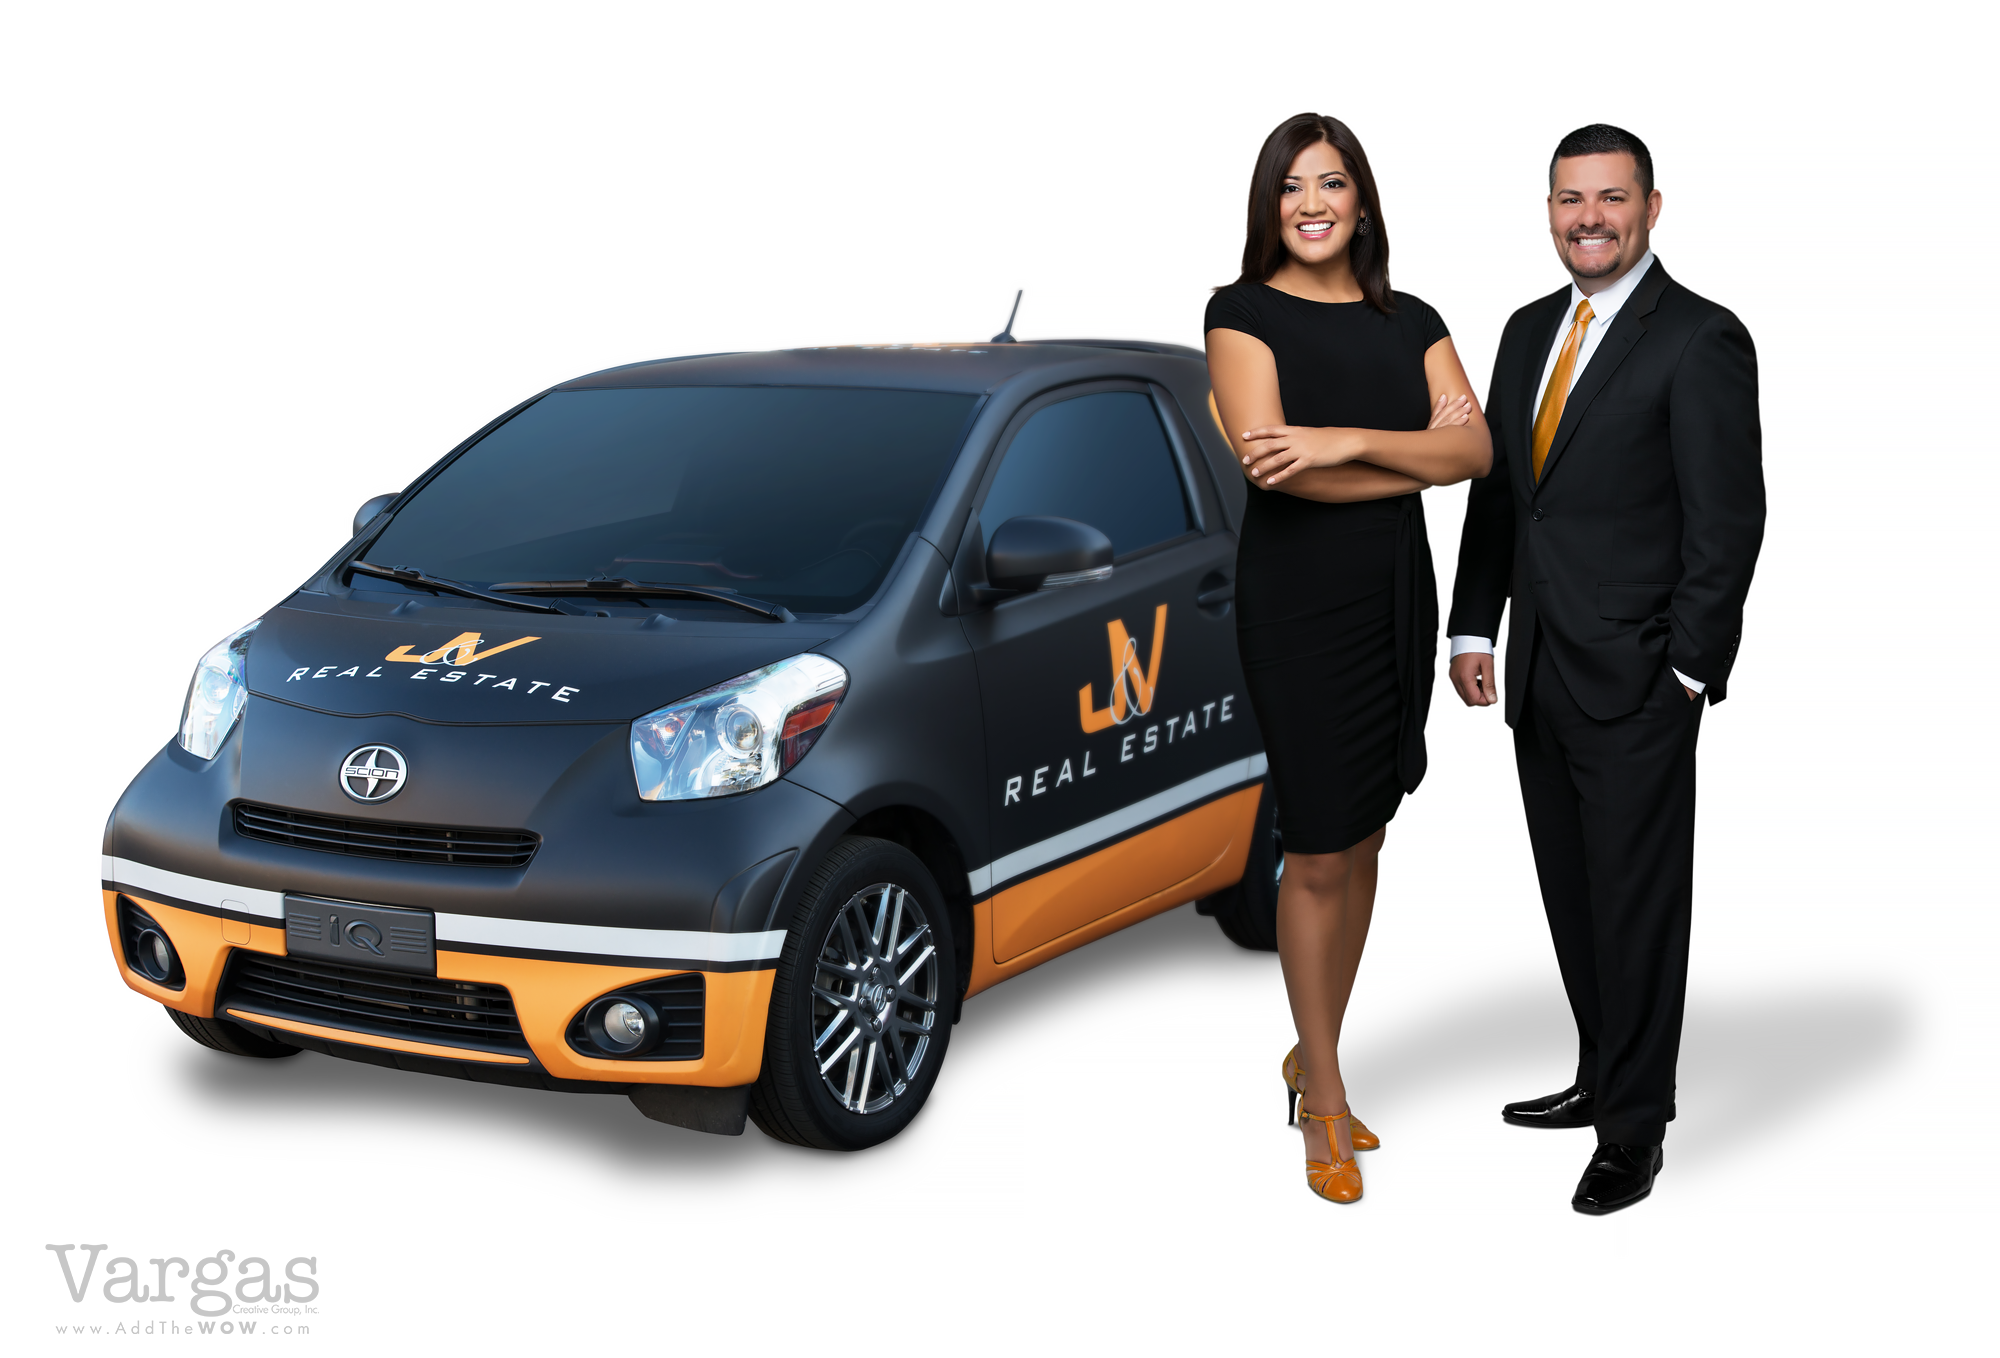 Car Real Estate: Vargas Creative Group, Inc